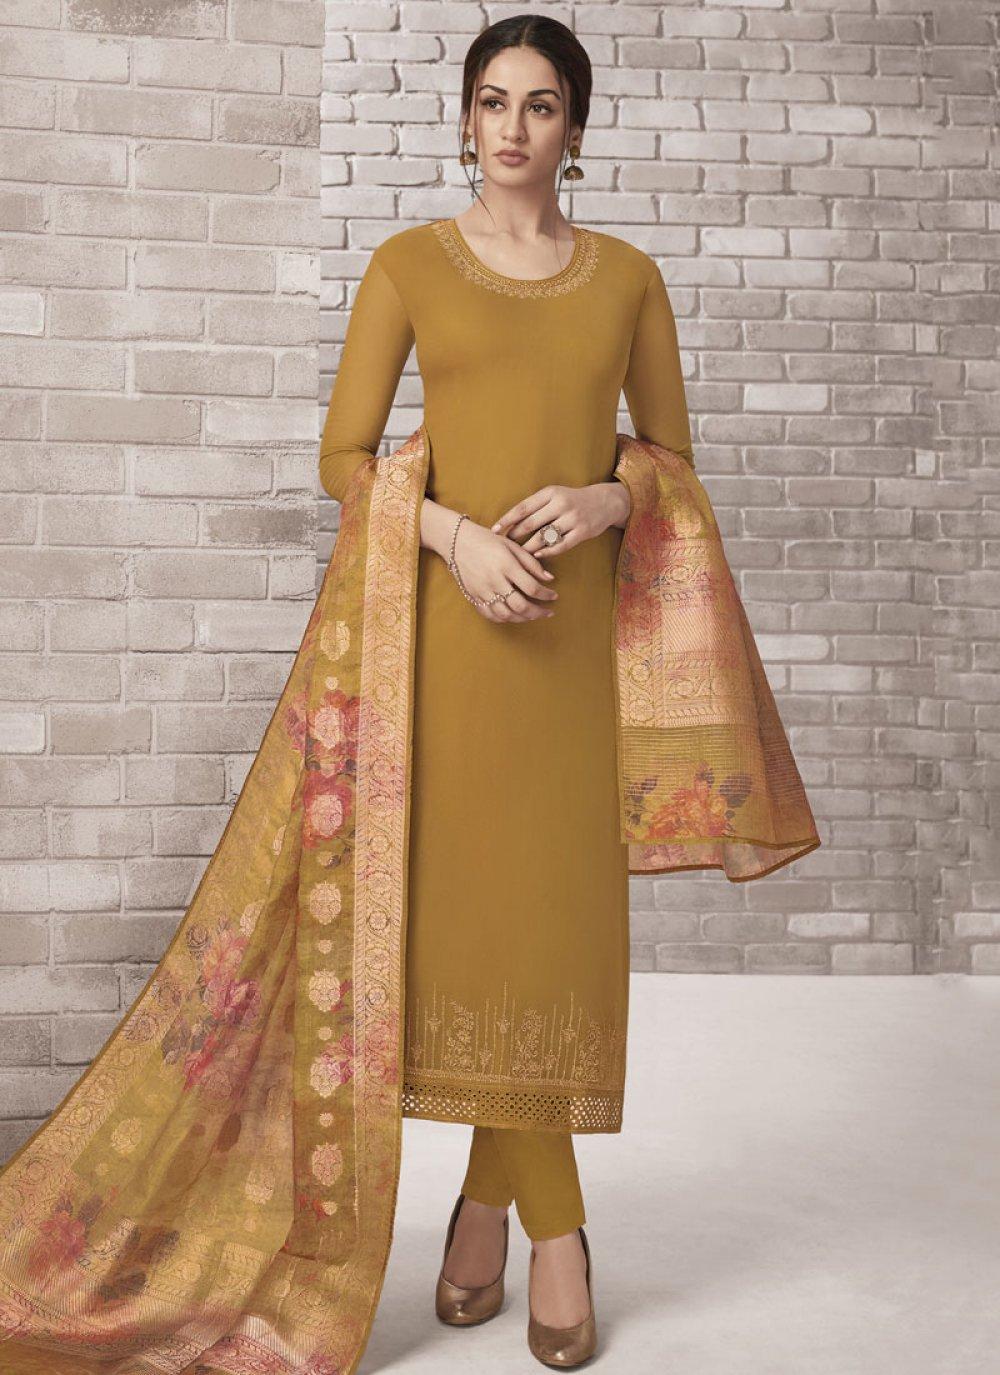 Churidar Designer Suit For Party